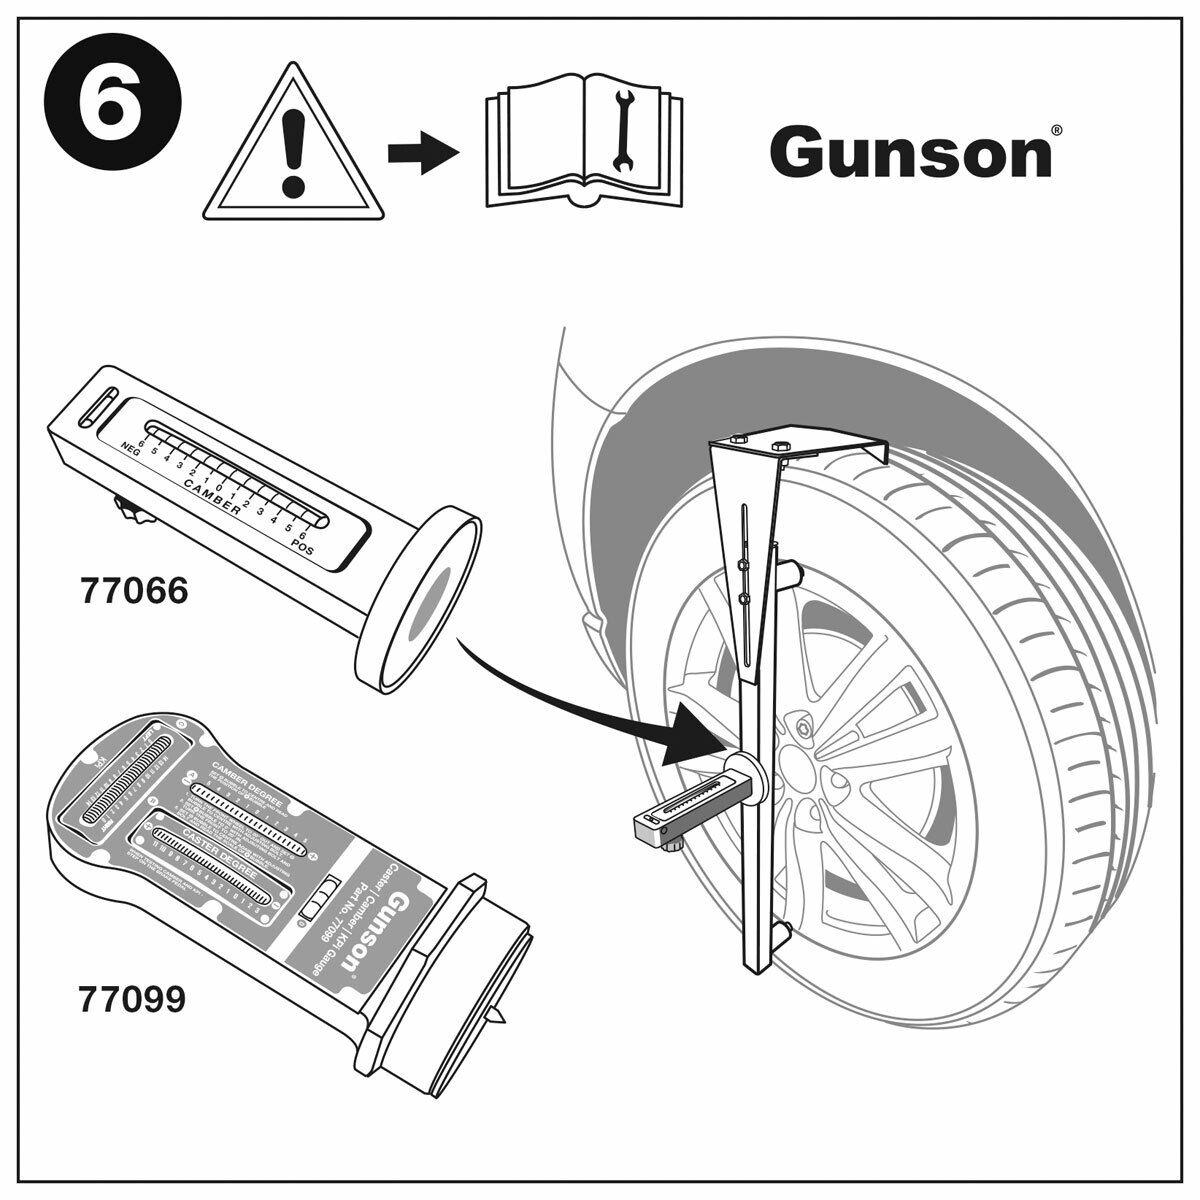 Gunson 77137 Trakrite Camber Bar Tool Adjustable for